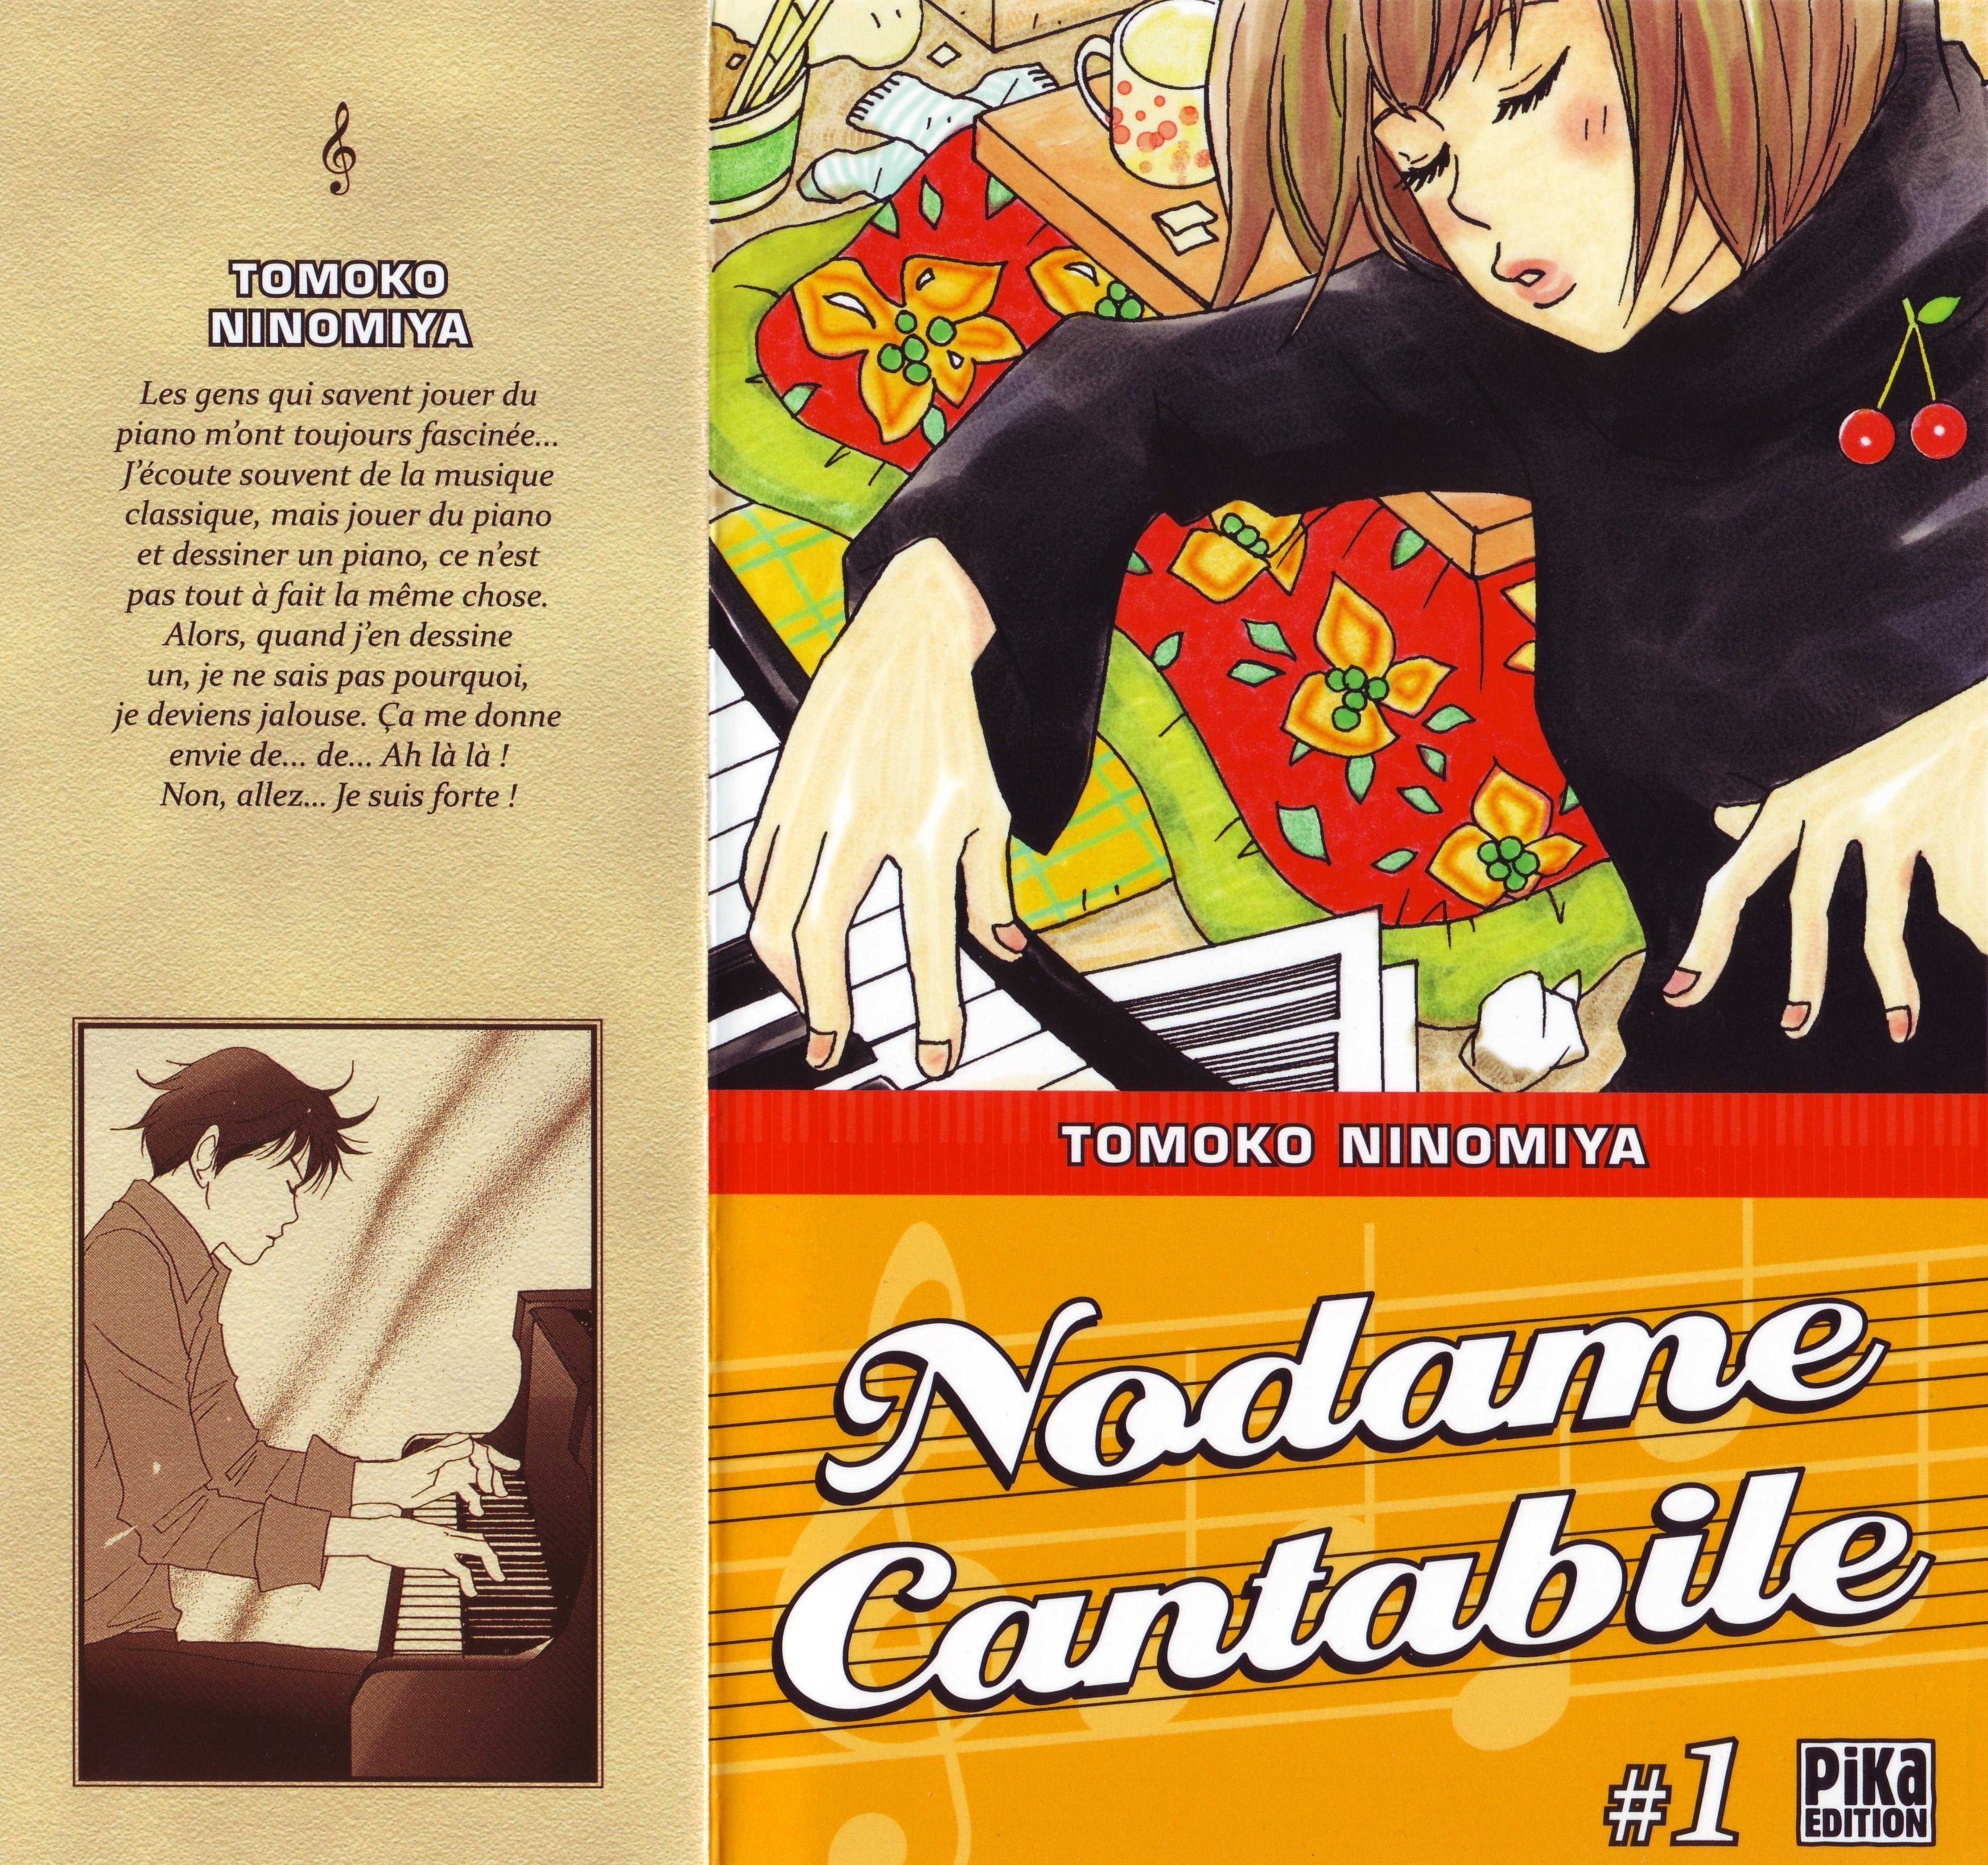 Nodame Cantabile/#463903